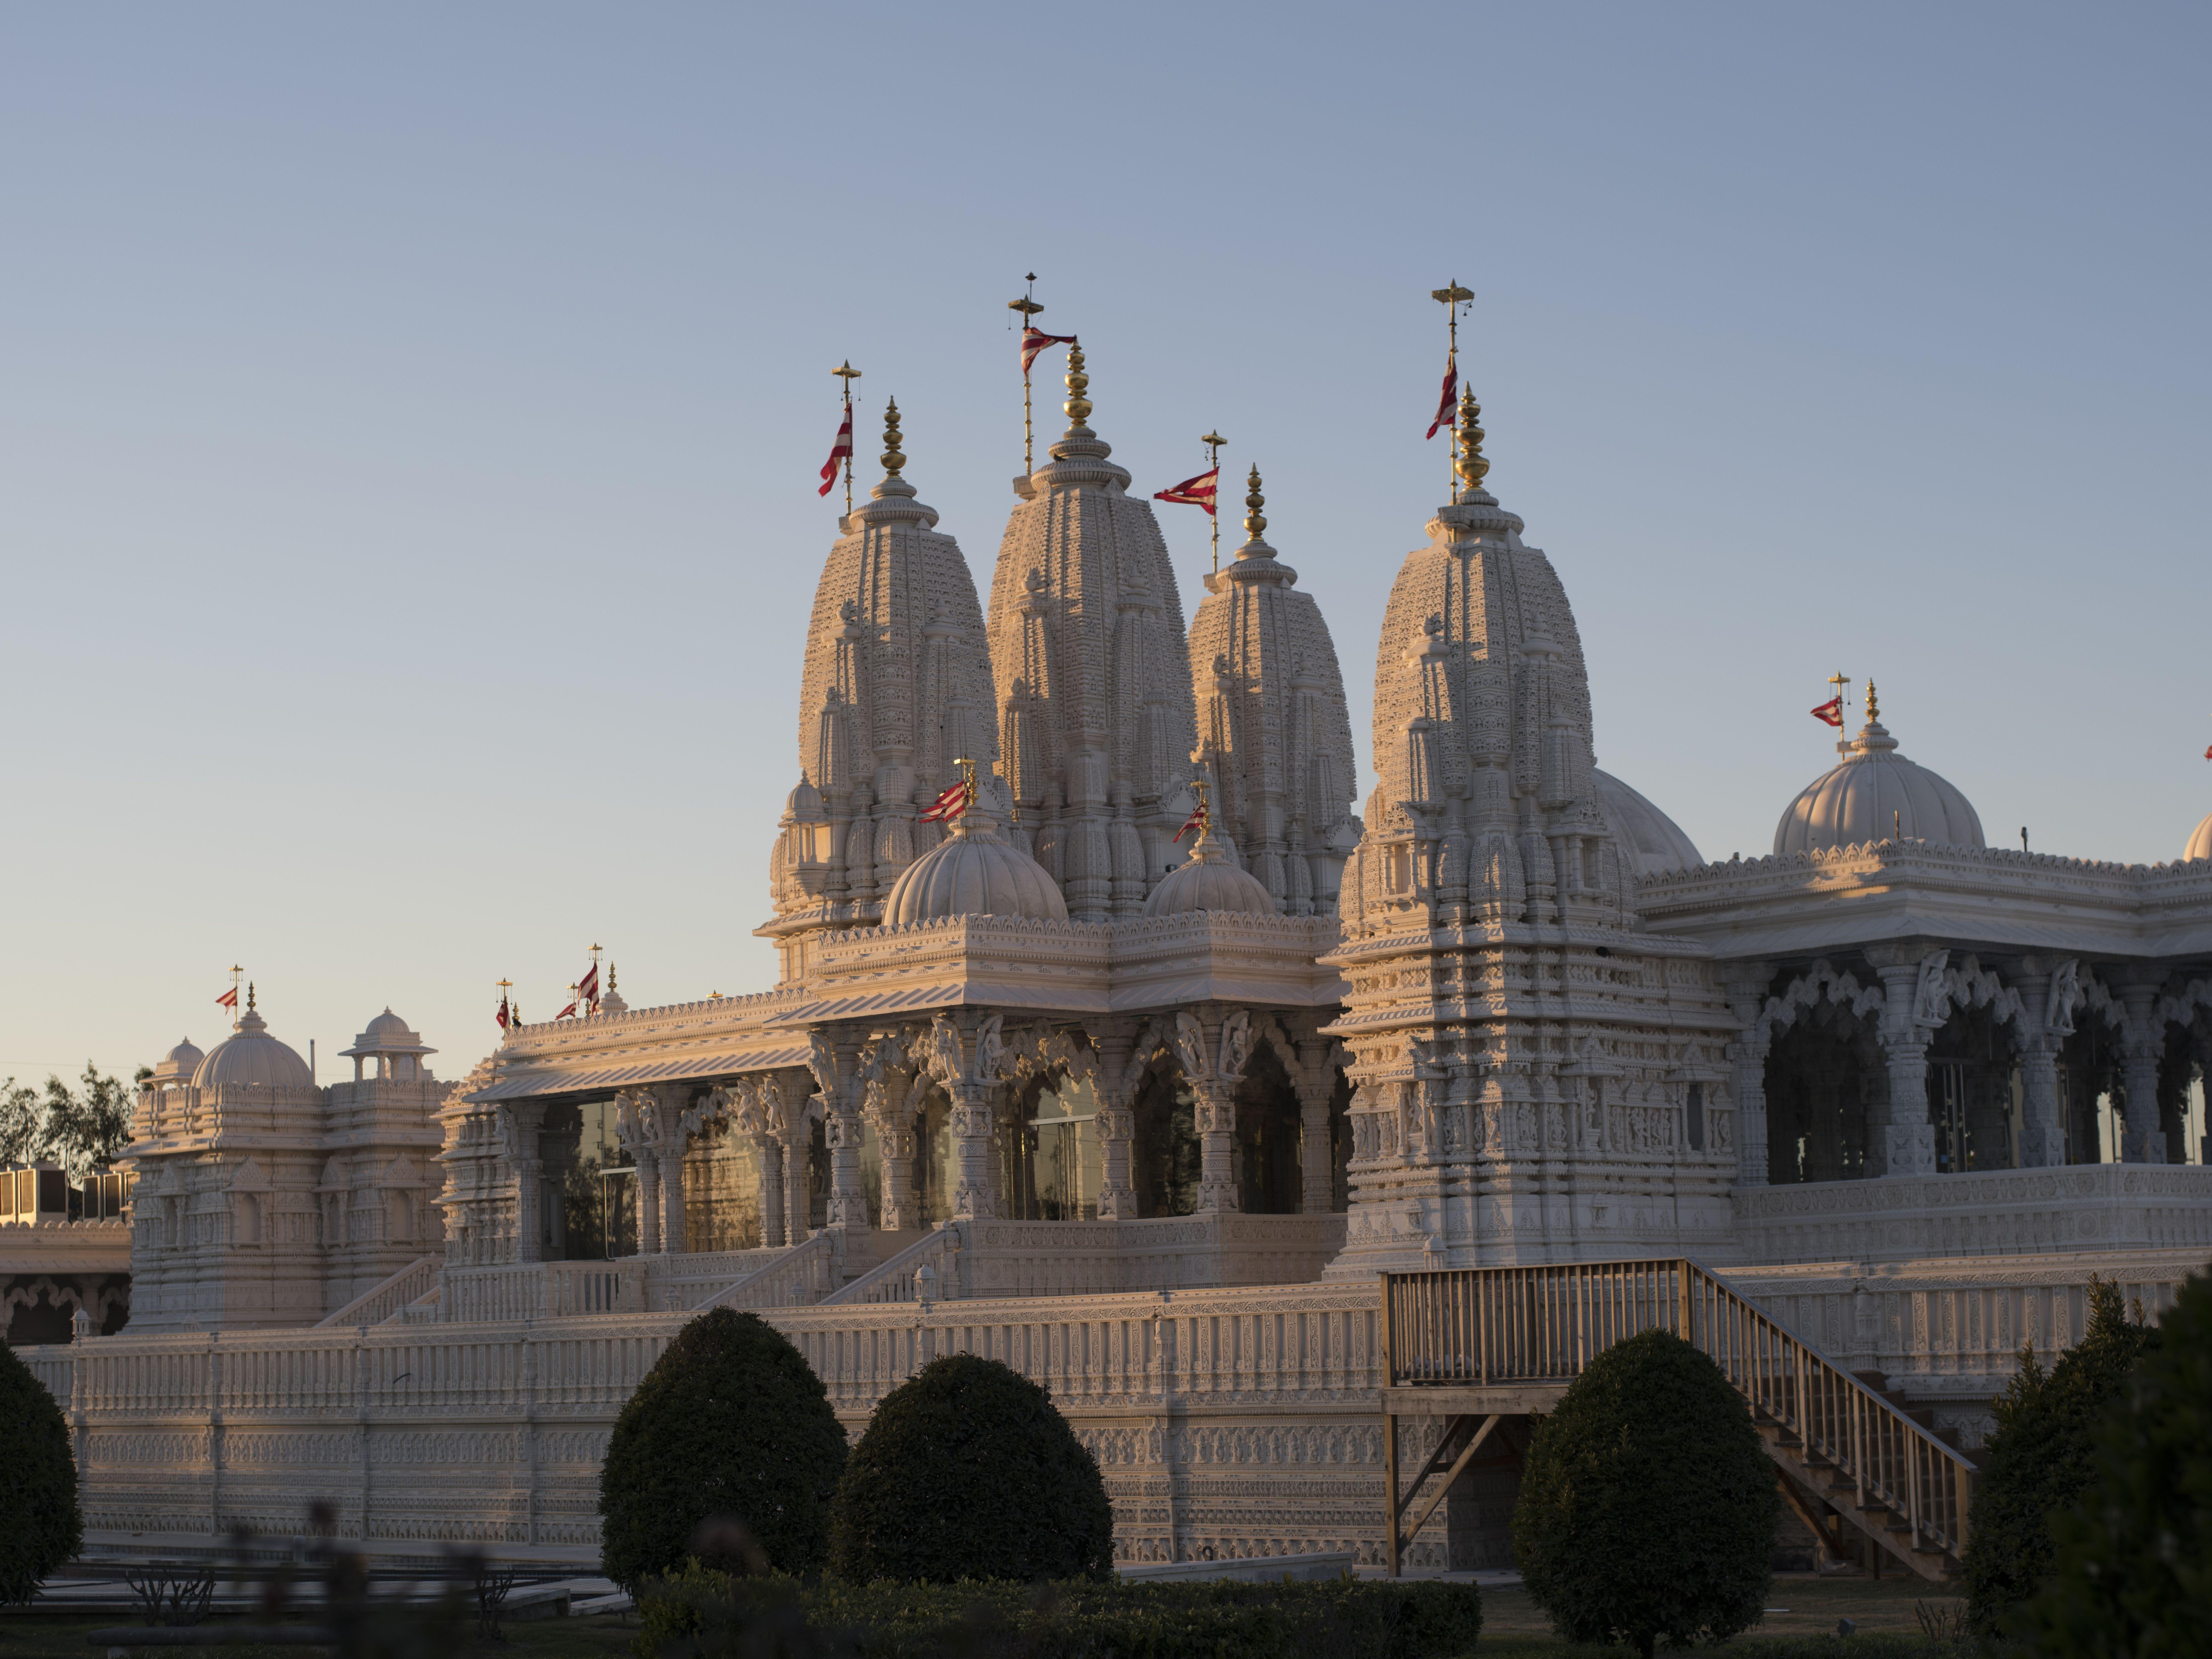 Shri swaminarayan mandir 011 zuqzlr